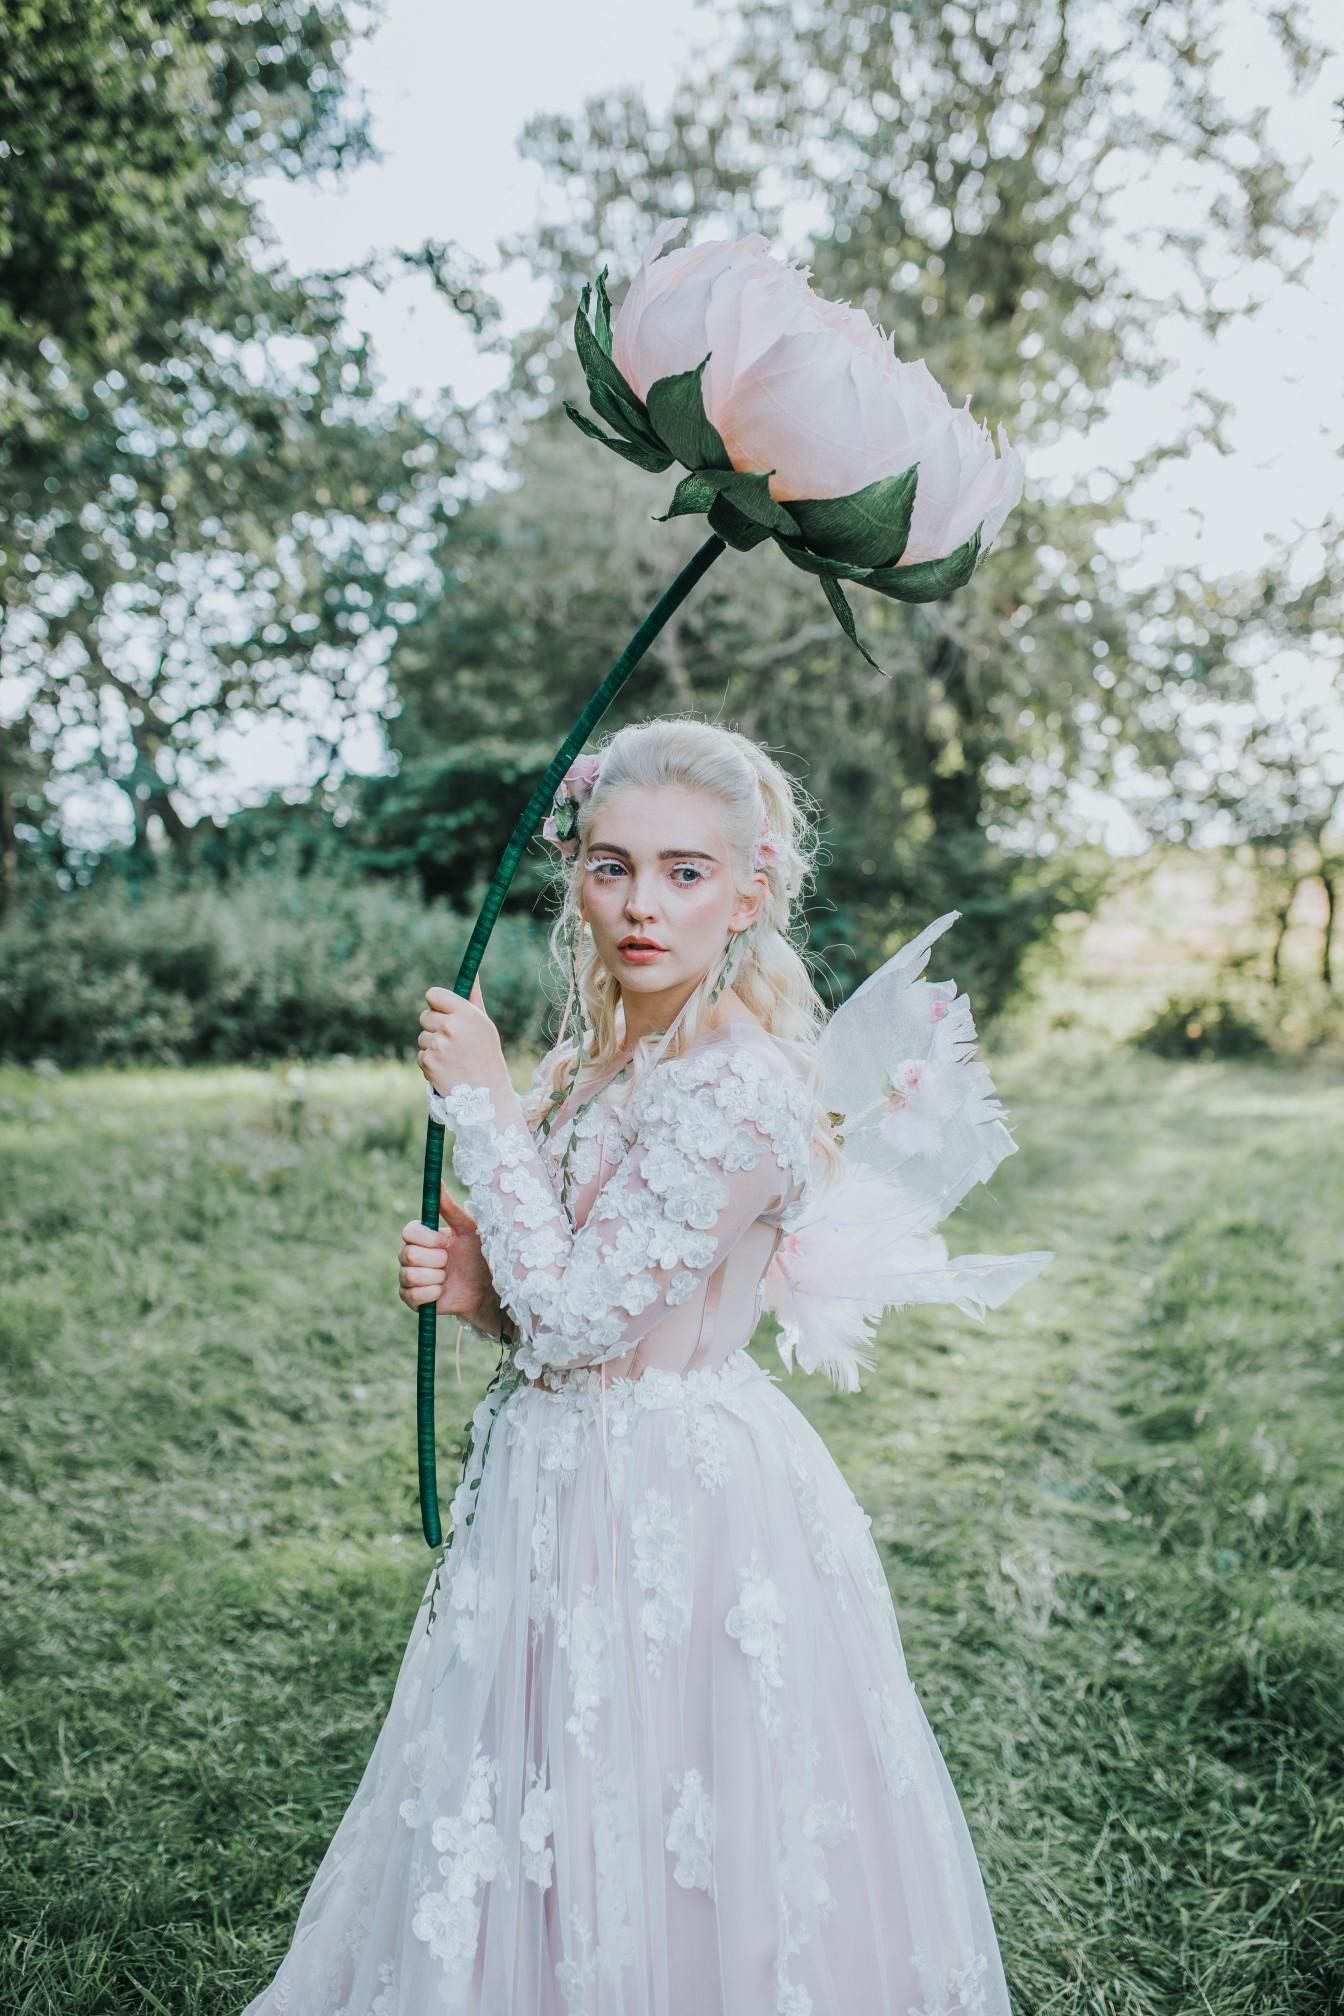 fairy wedding - whimsical wedding - magical wedding - elegant wedding dress - artistic wedding photos - large paper flower prop - fairy bride - creative wedding photos - wedding editorial